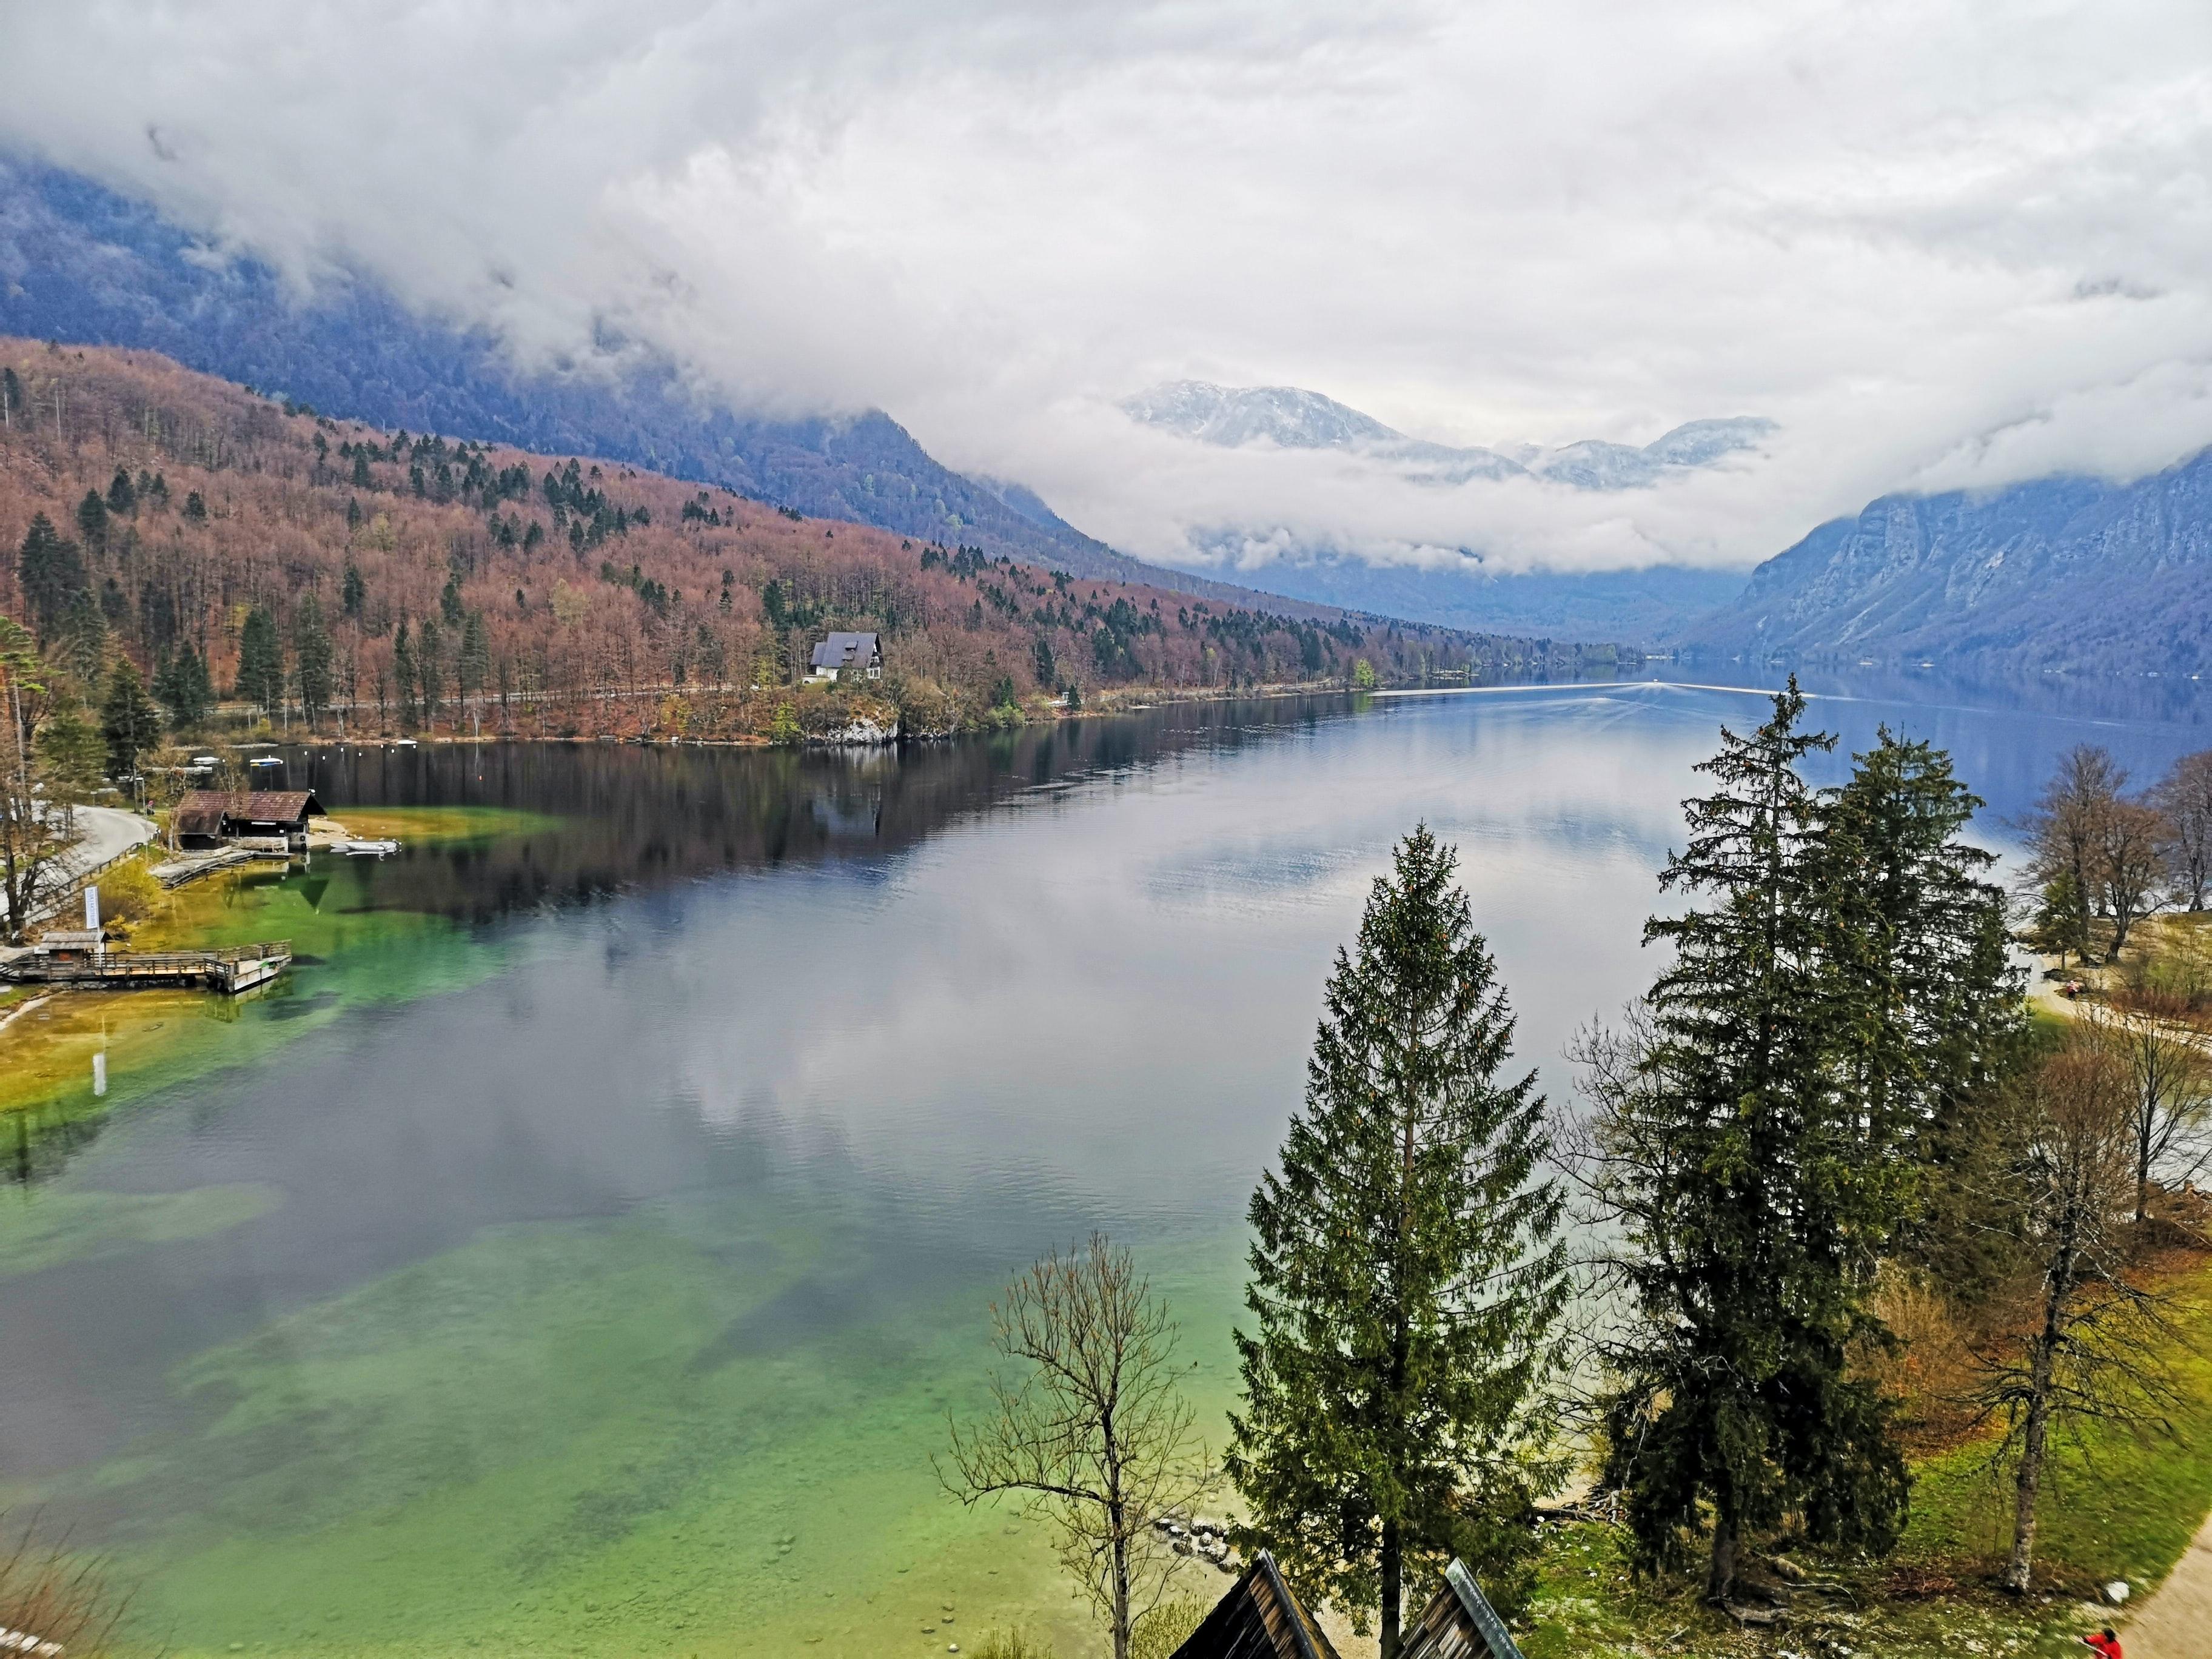 Lake Bohinj slovenia, lake constance, switzerland, germany, austria, lake, views stays europe vacation lindau summer 2021 holiday experience localbini biniblog